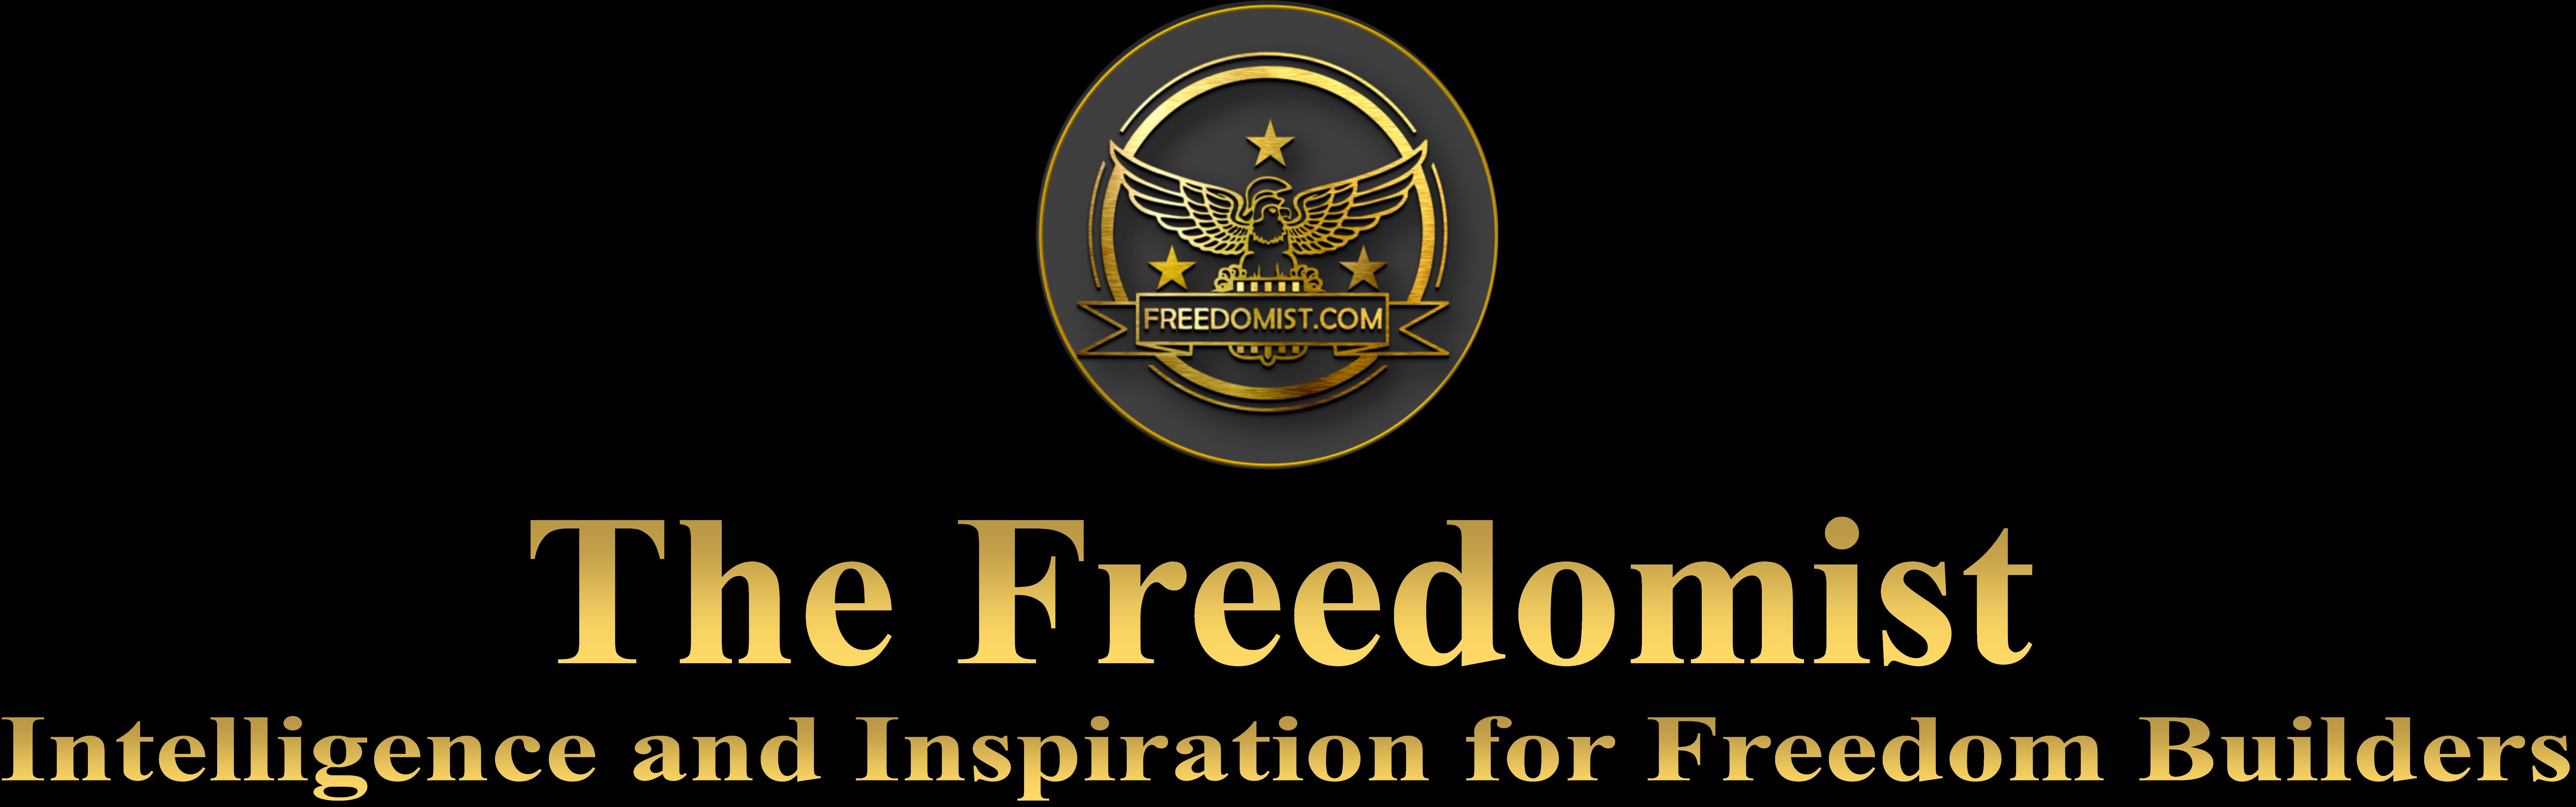 The Freedomist